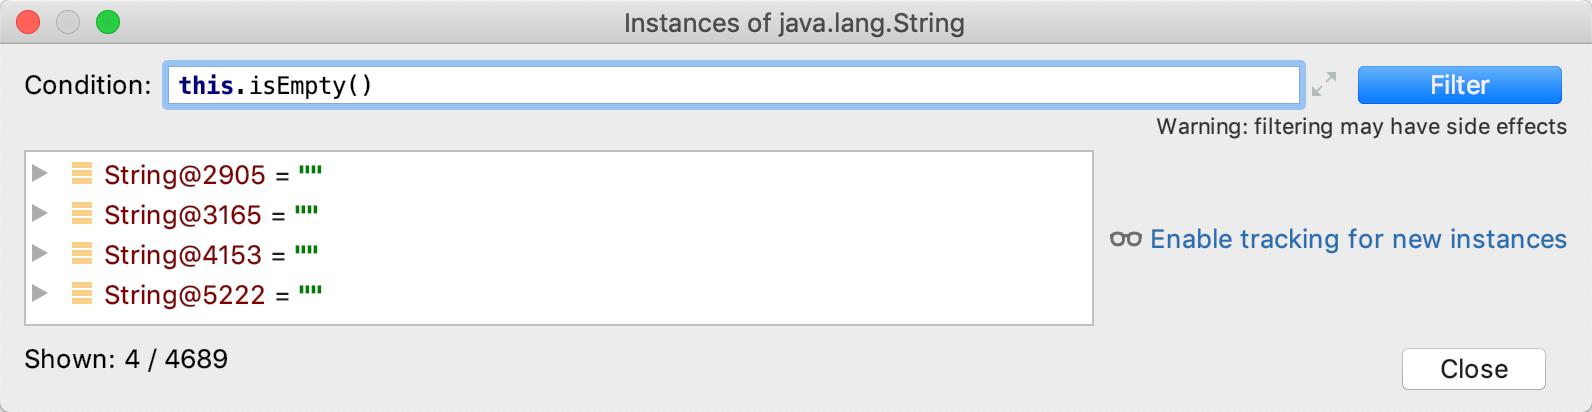 debug analyze heap instances